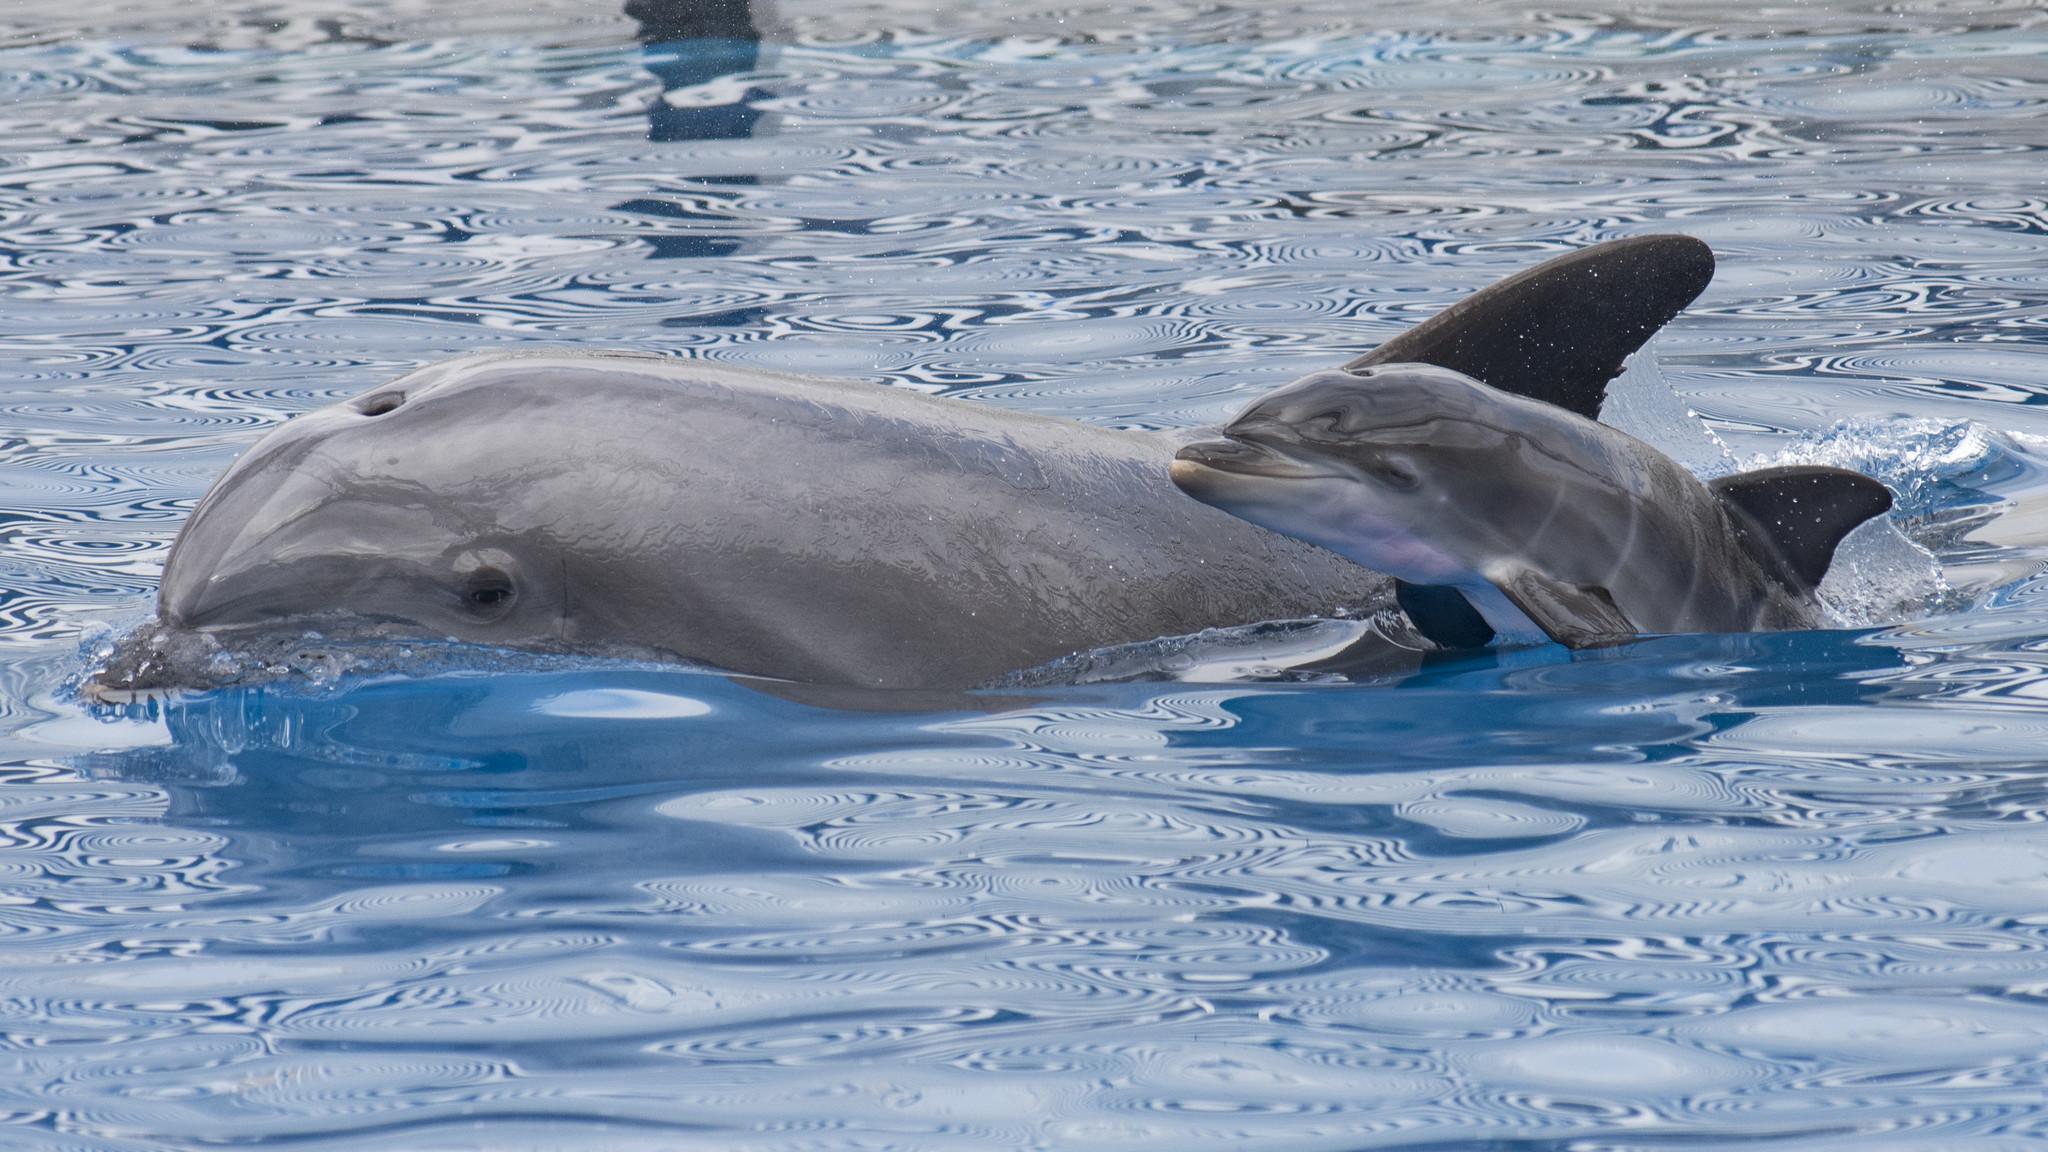 Bottlenose dolphin born at SeaWorld